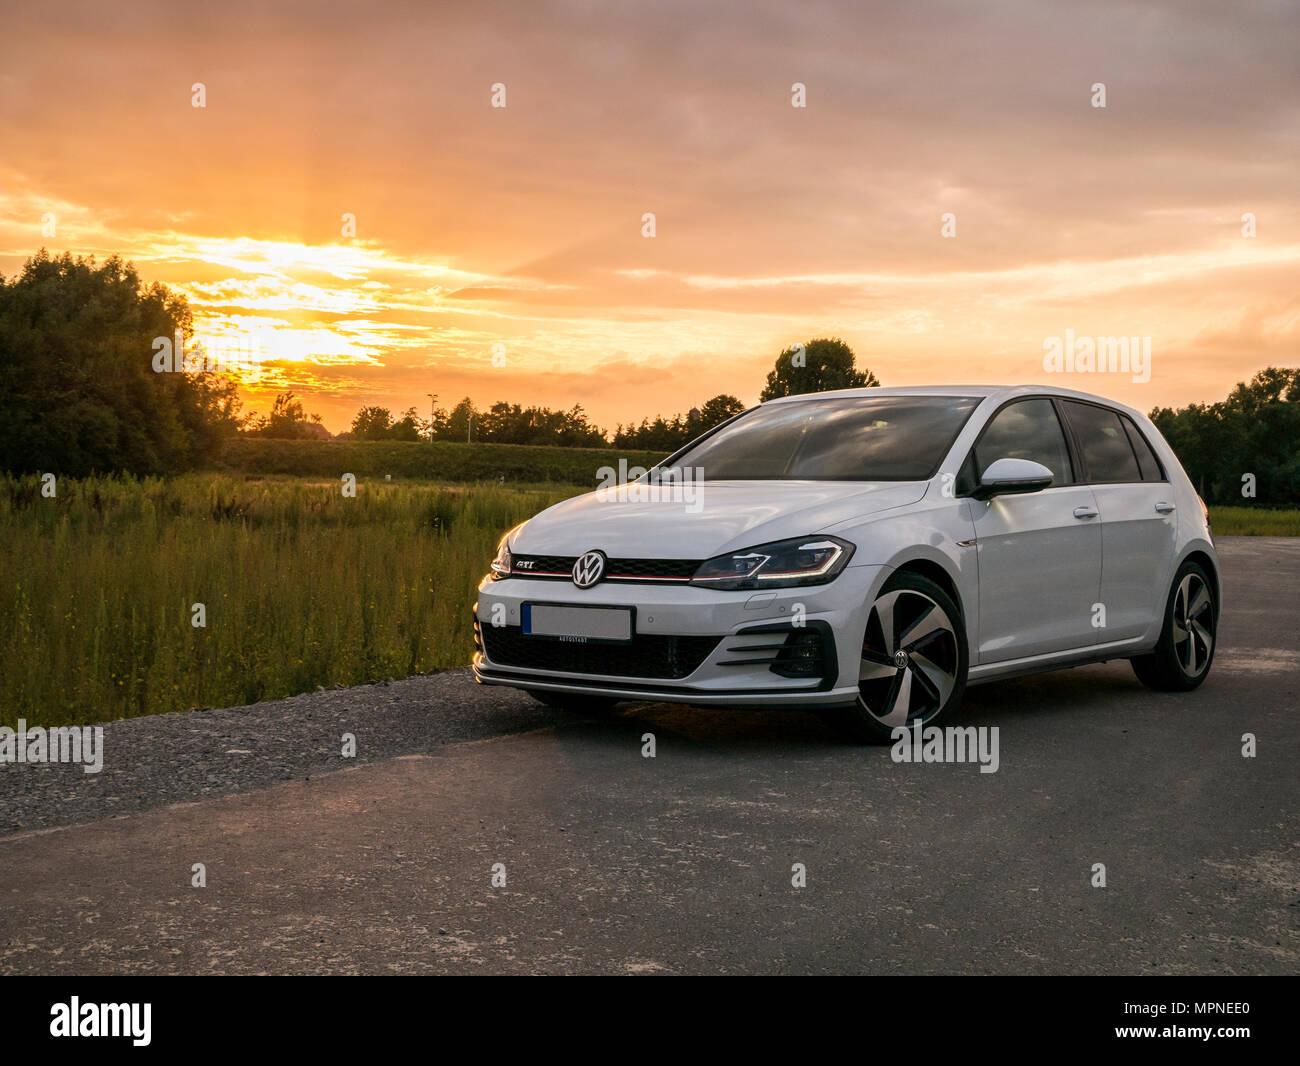 VW Golf GTI 7 Facelift - Stock Image